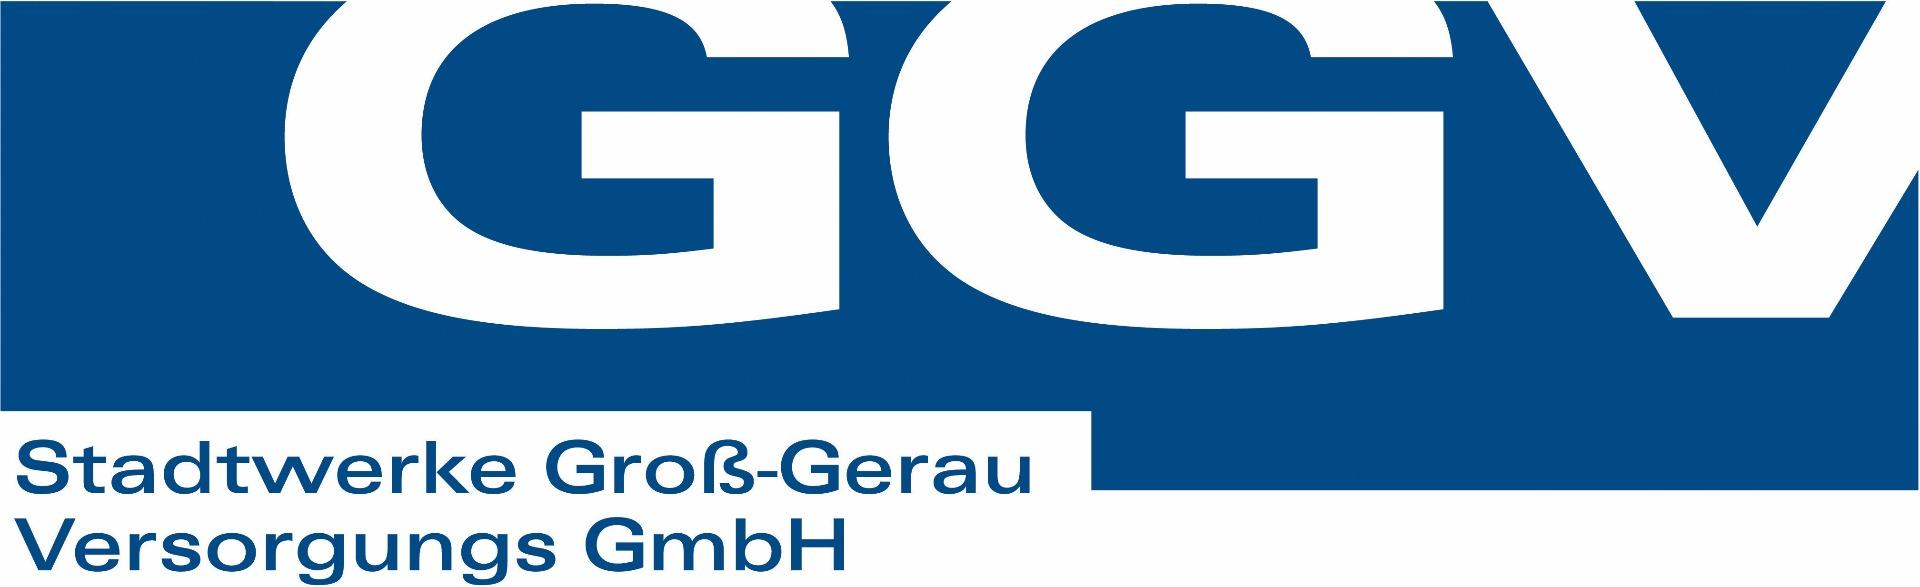 GGV_LOGO_GROSS_RGB